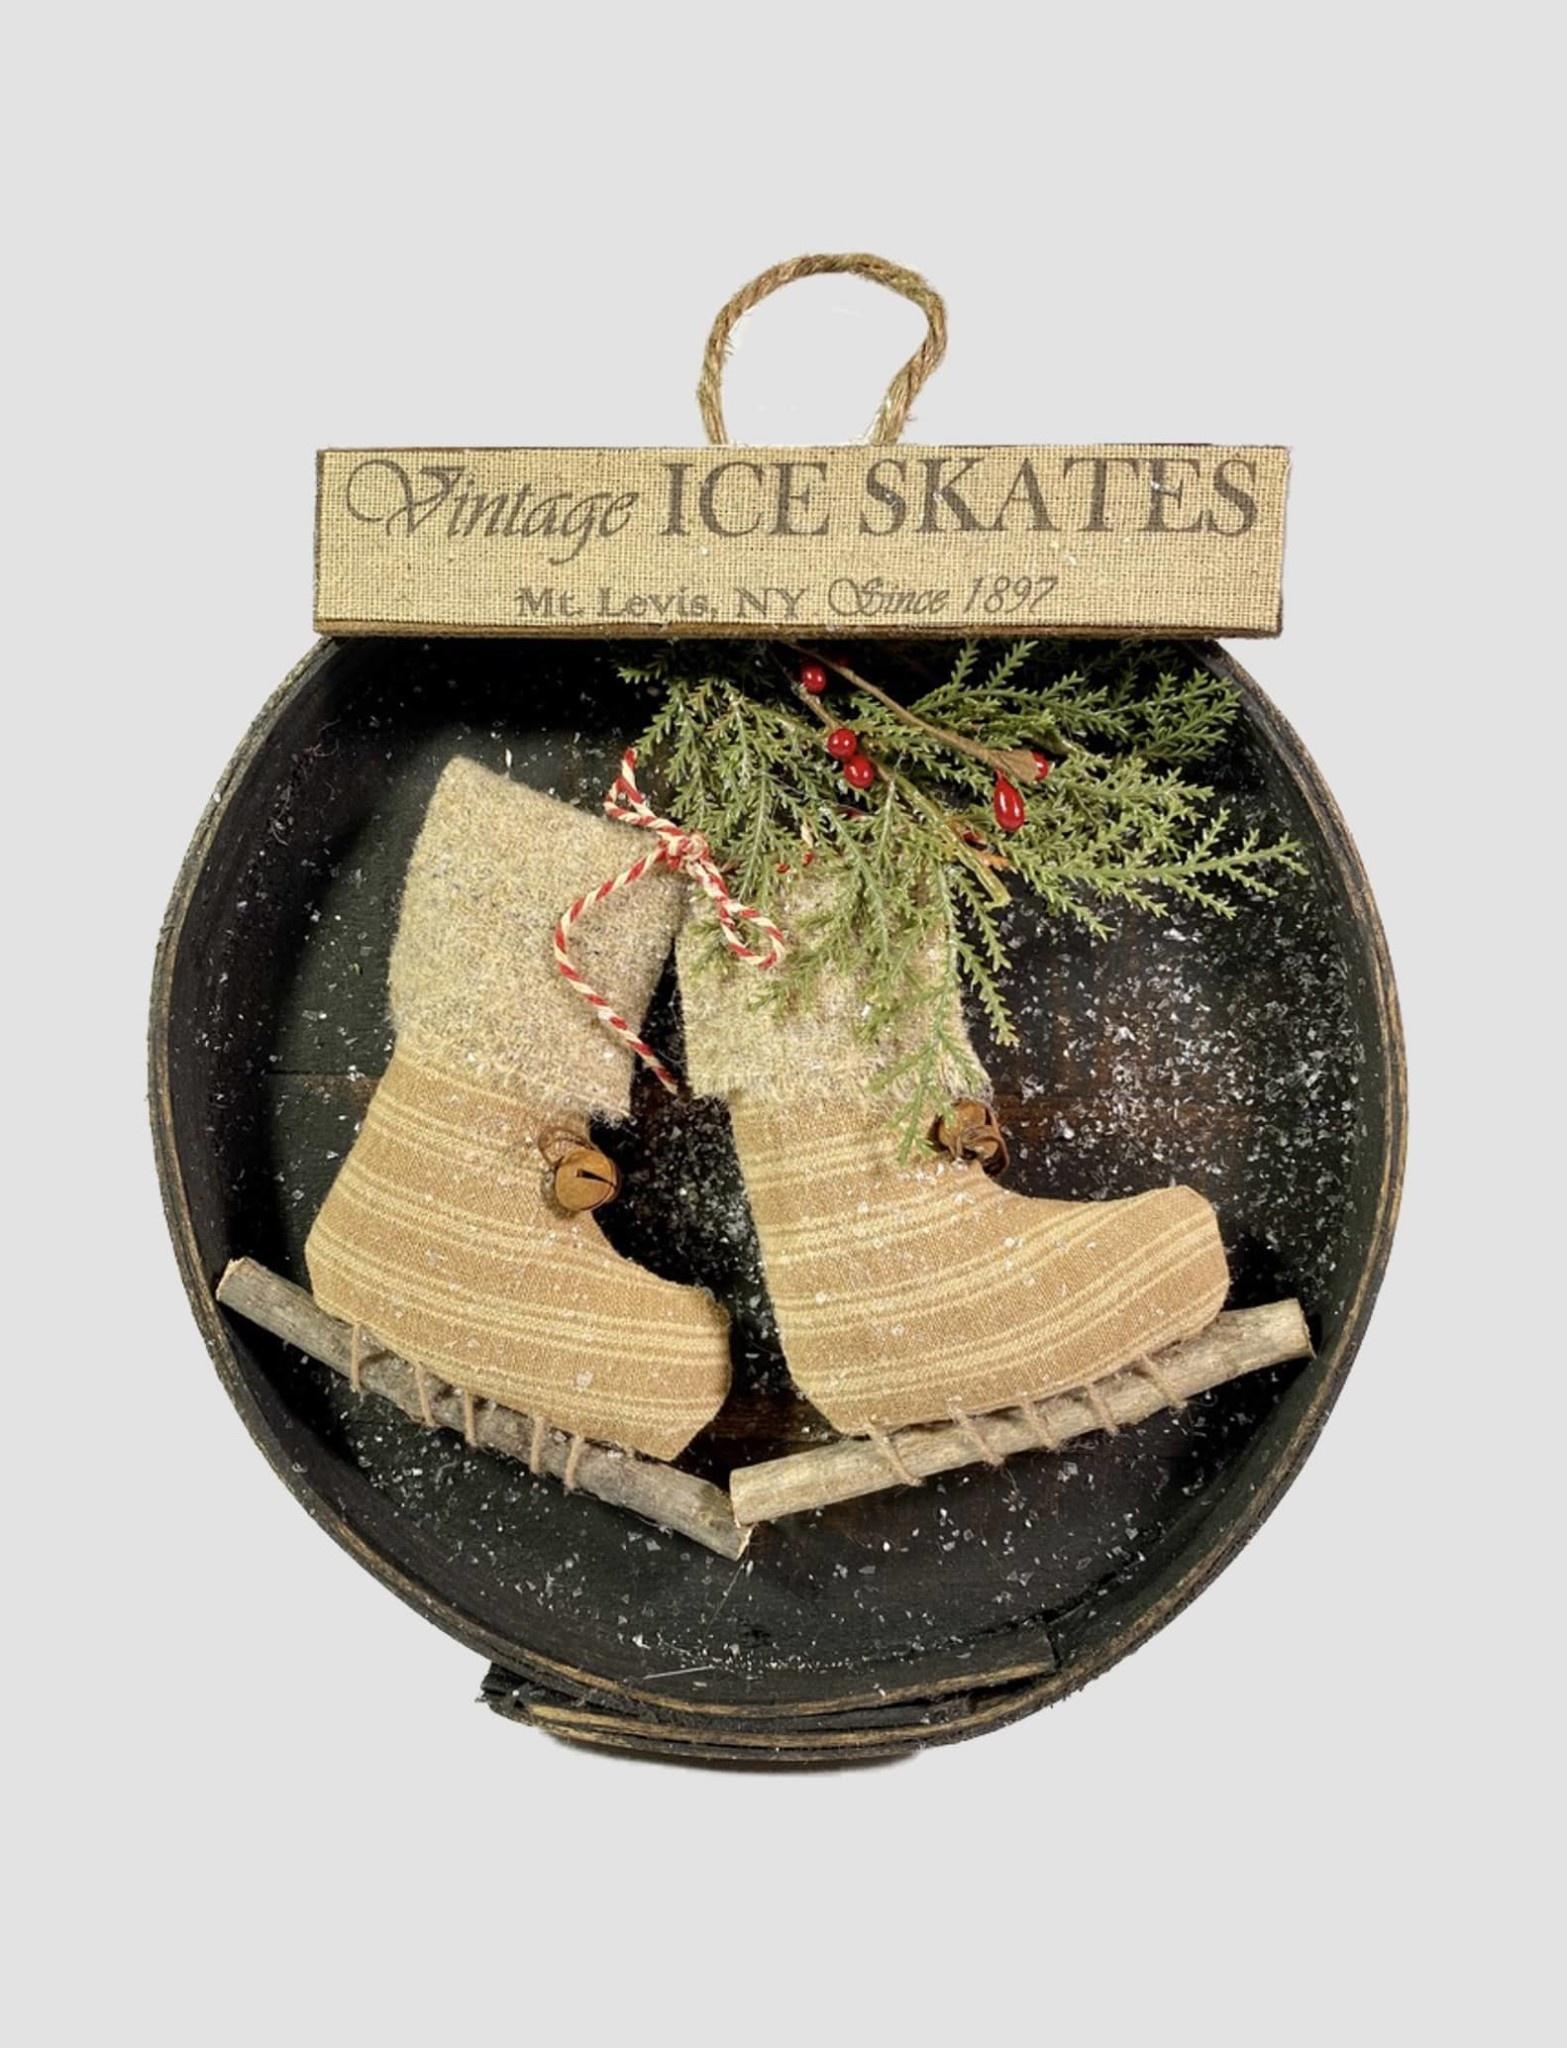 Nana's Farmhouse Vintage Ice Skates Round Box  with Greens